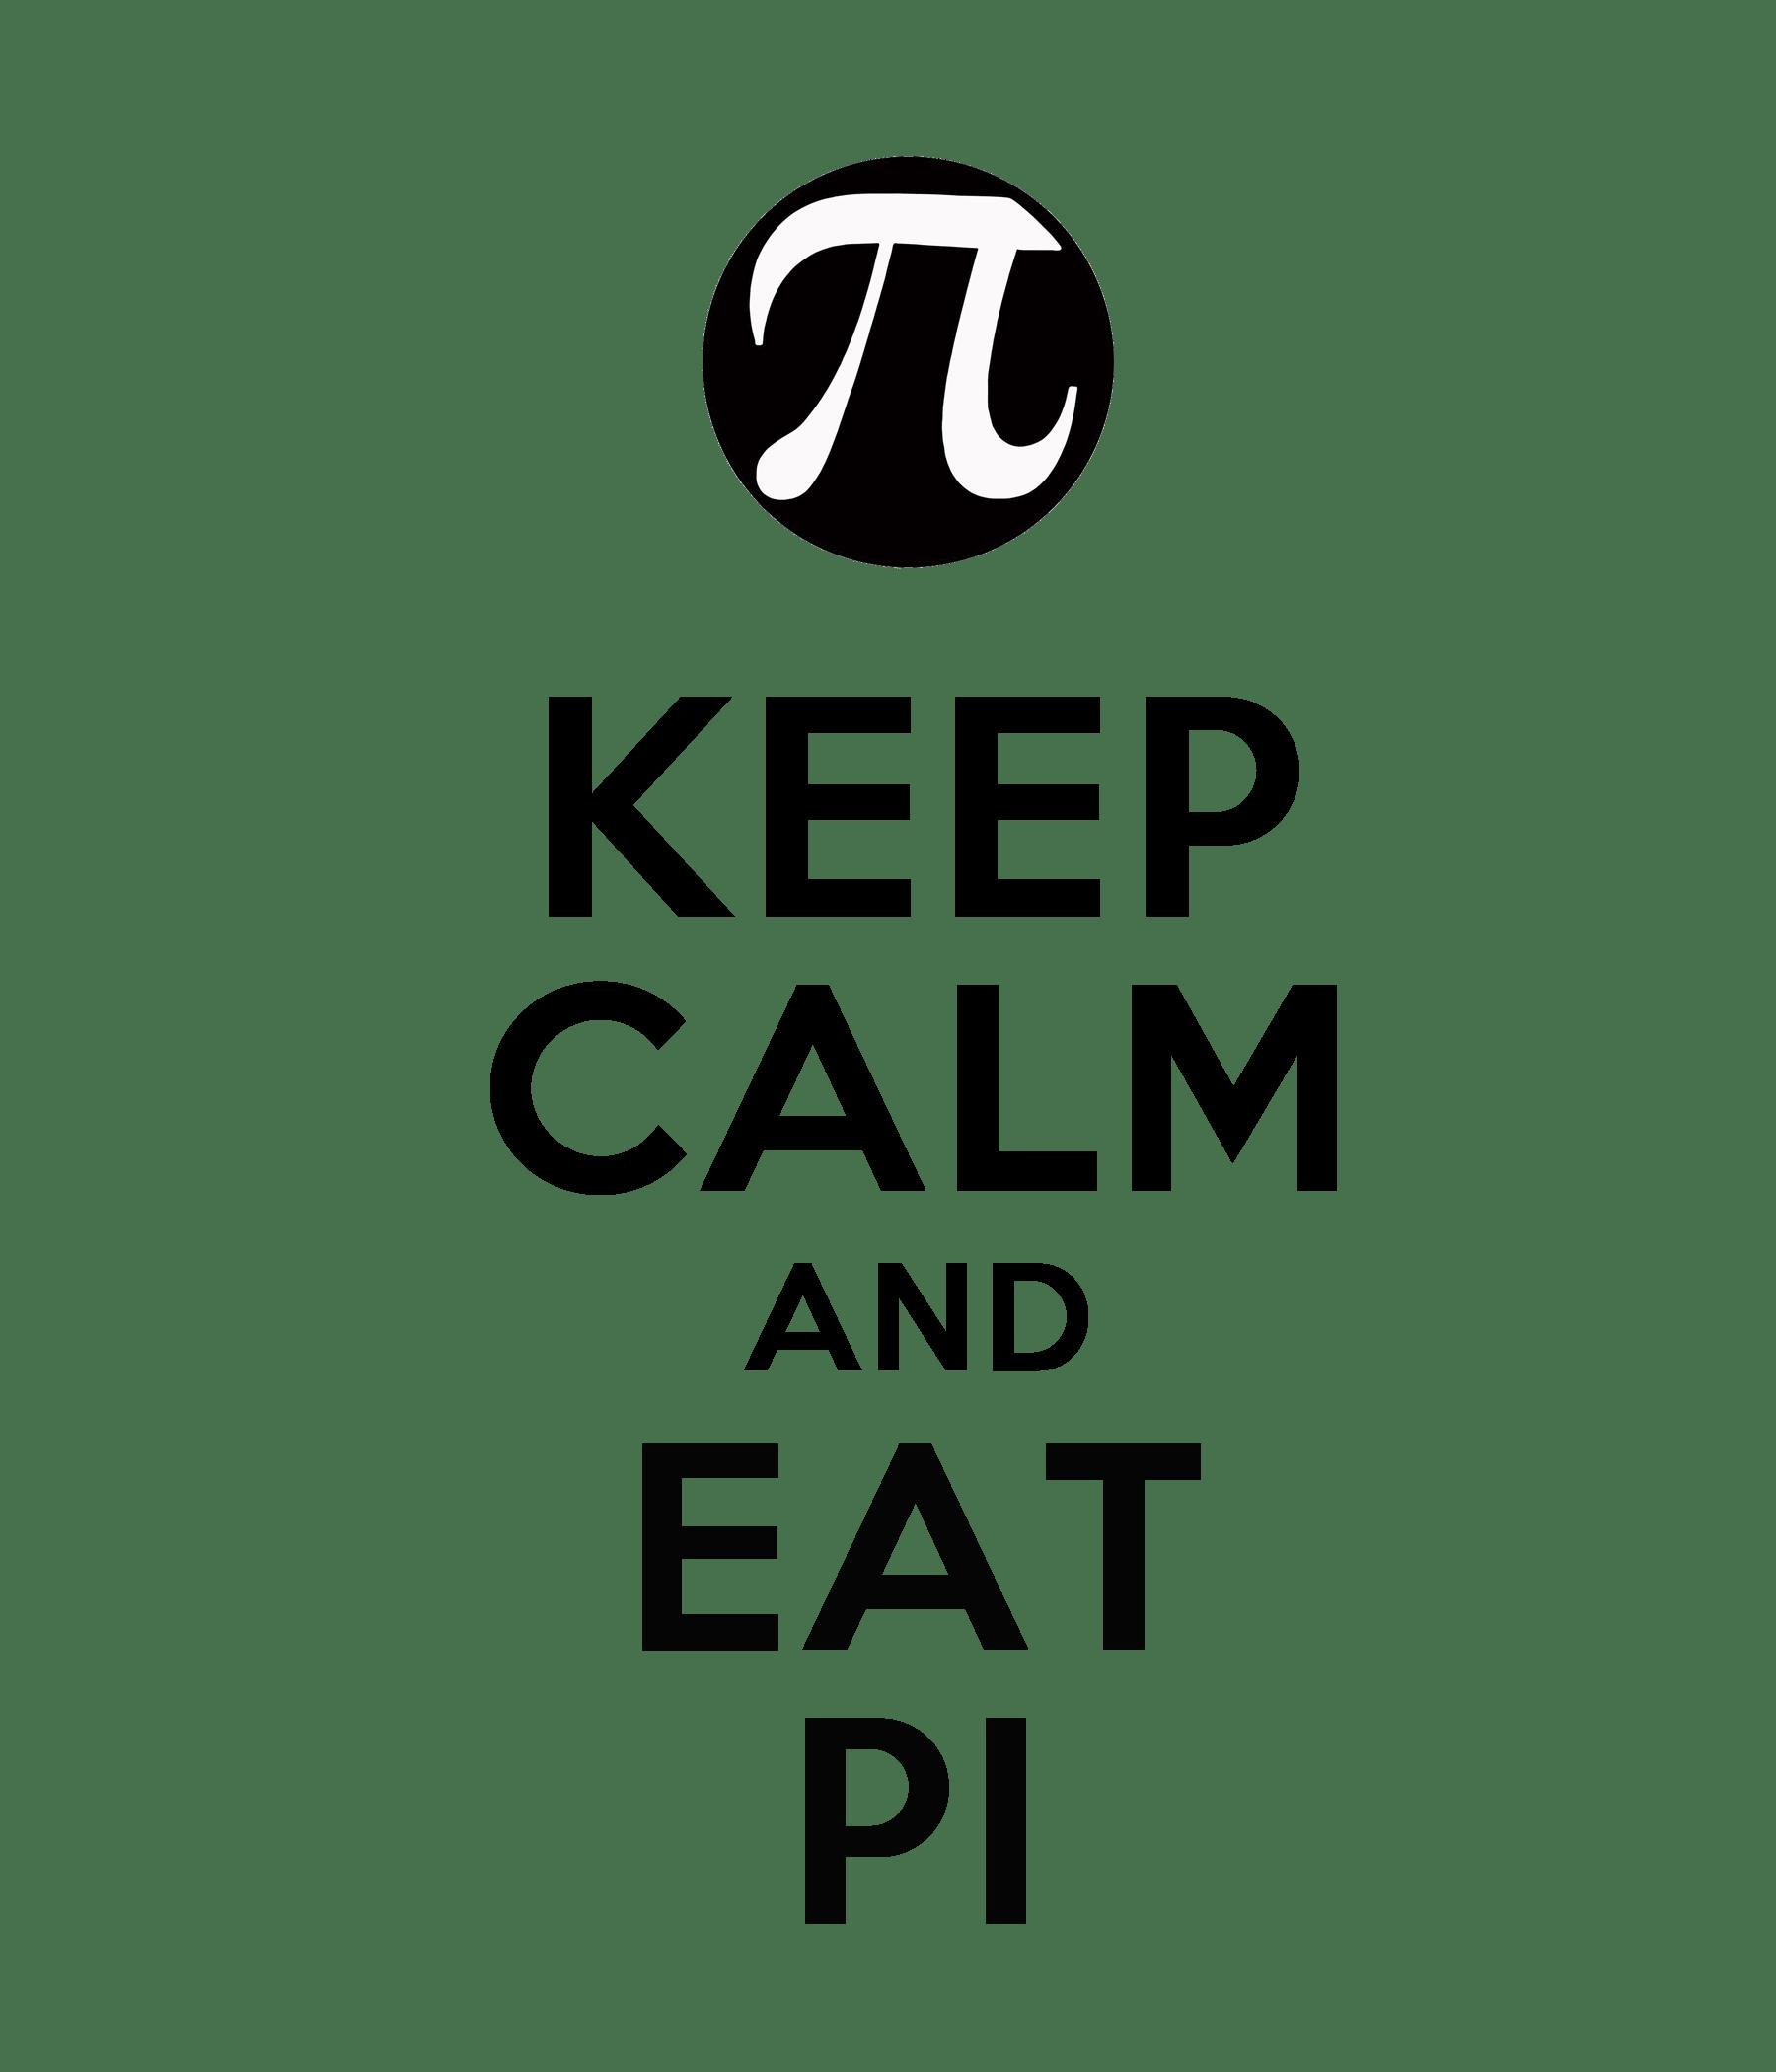 The Pi Symbol Trademarked I Think Not